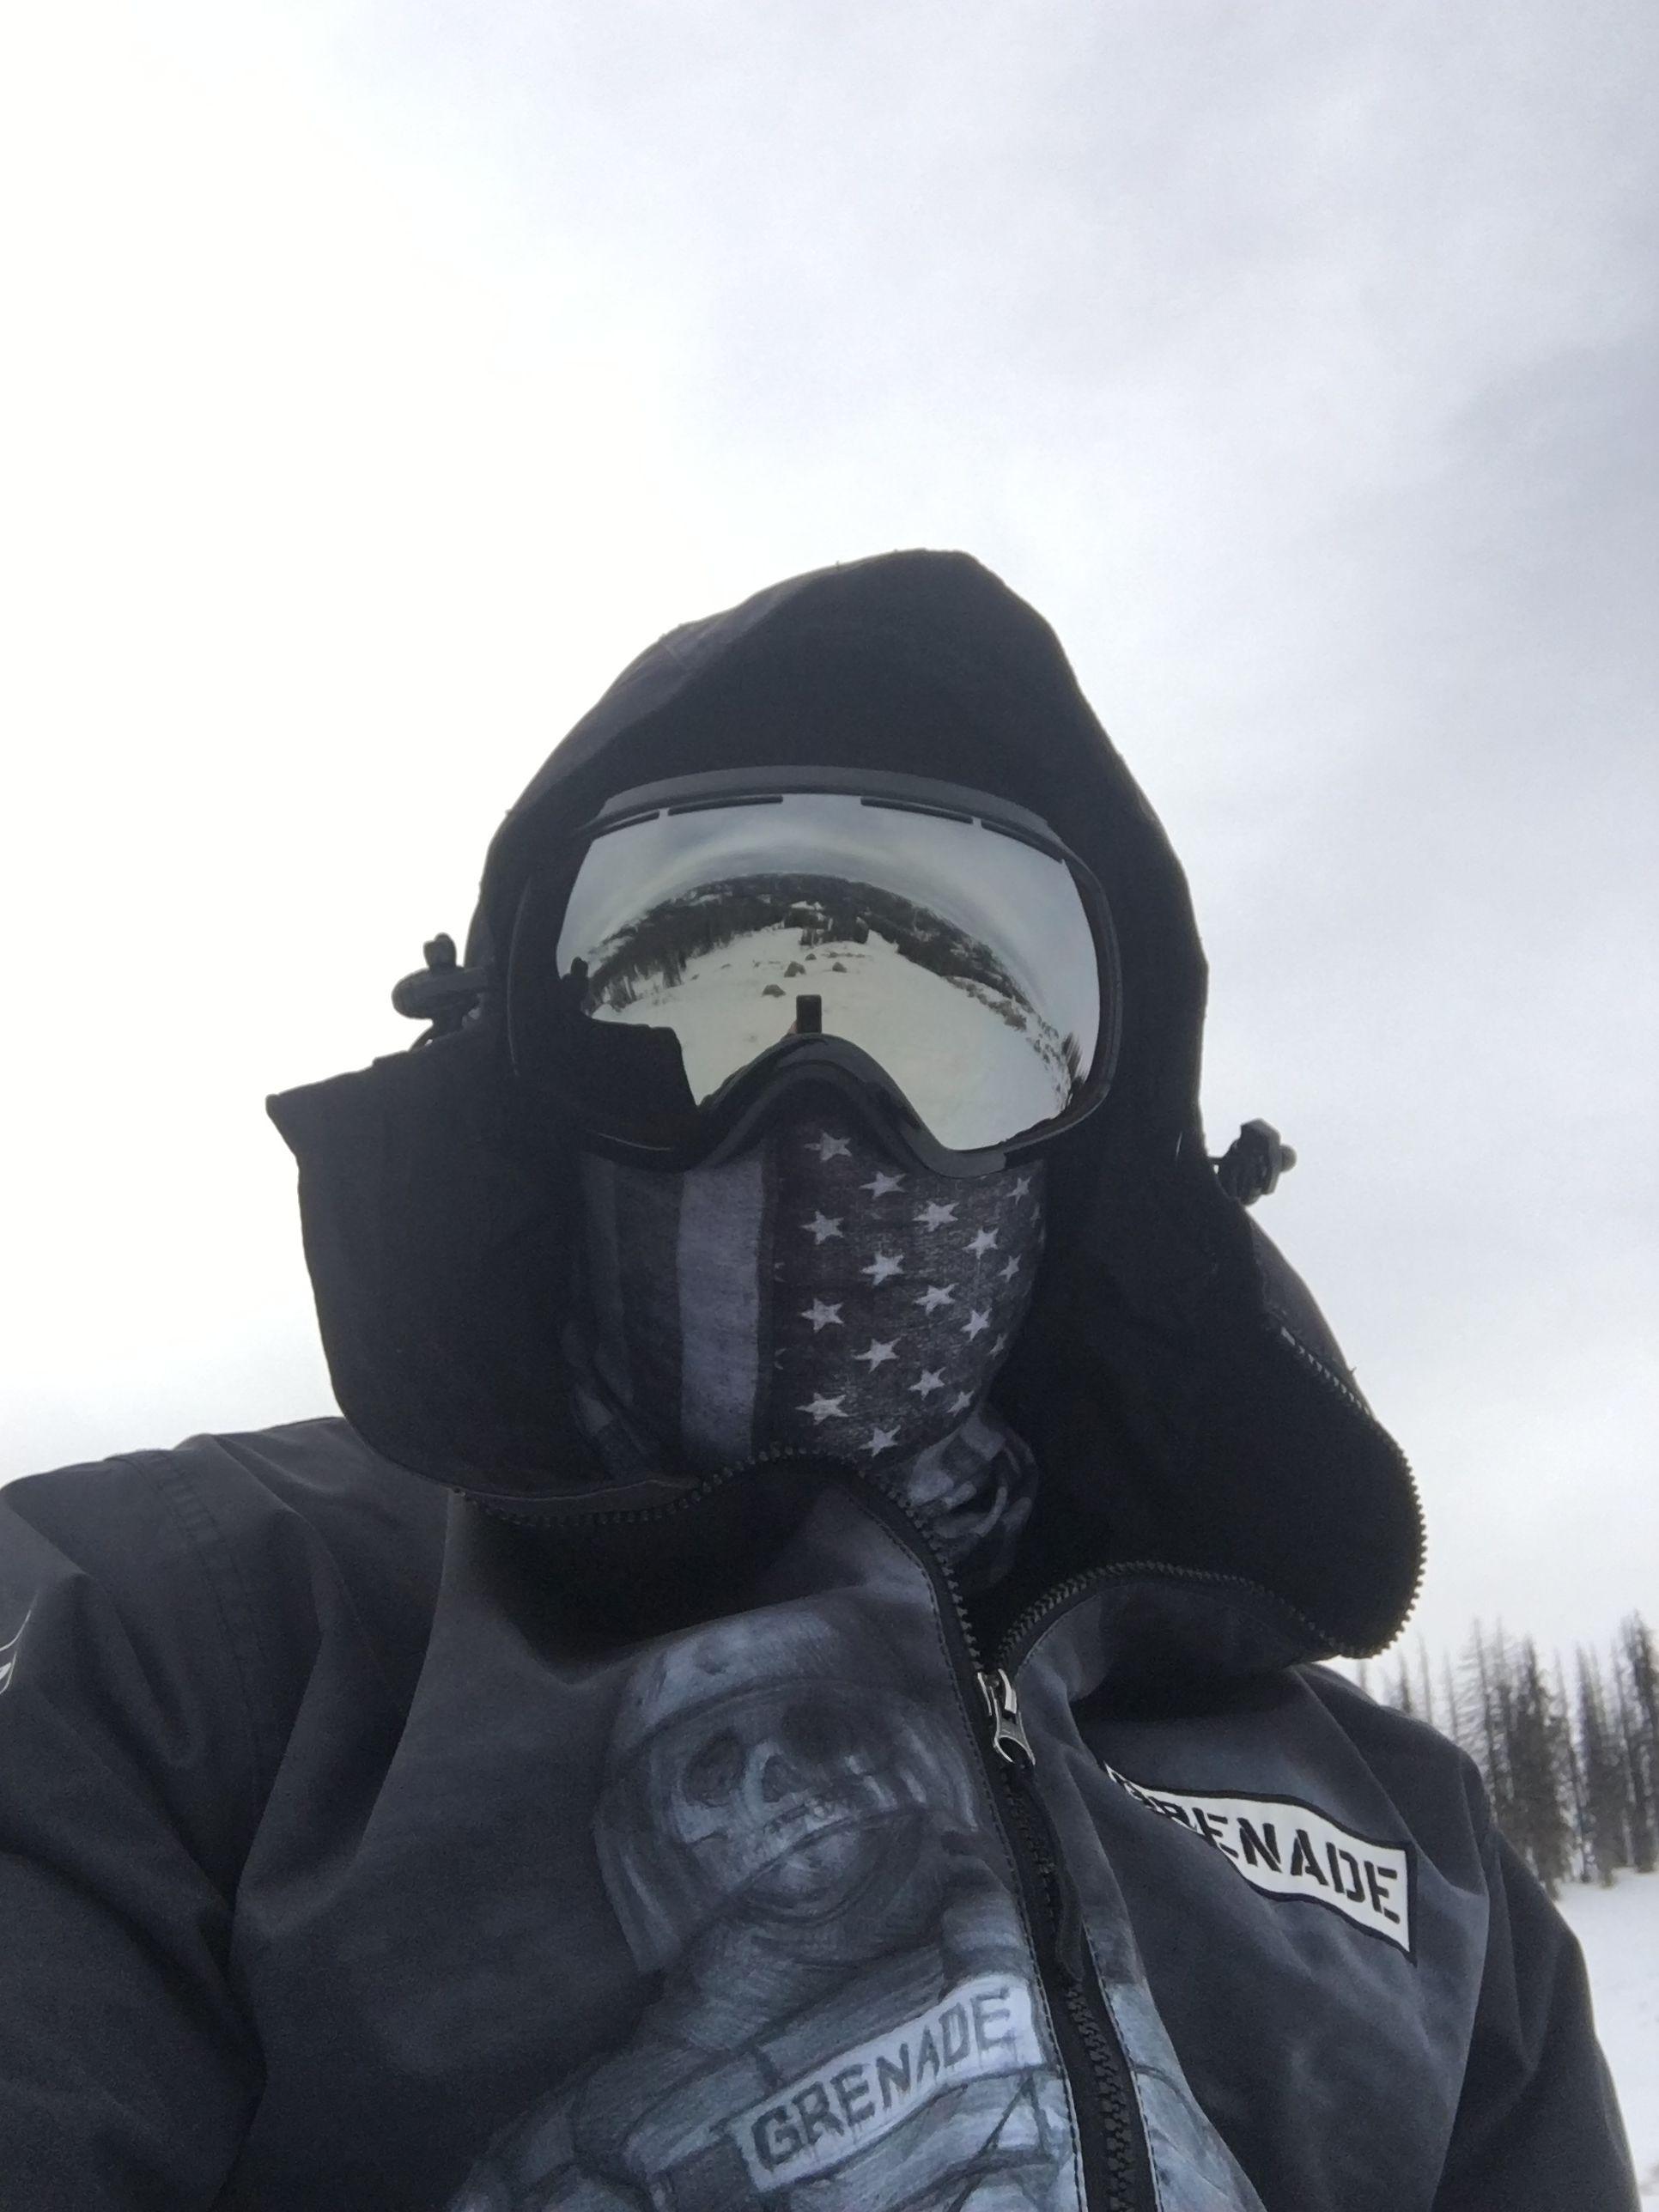 Hooligan  scoggins shared his time on the slopes with us. He s rockin the   Merica  hoorag  snowboard  bandana e63da37b9